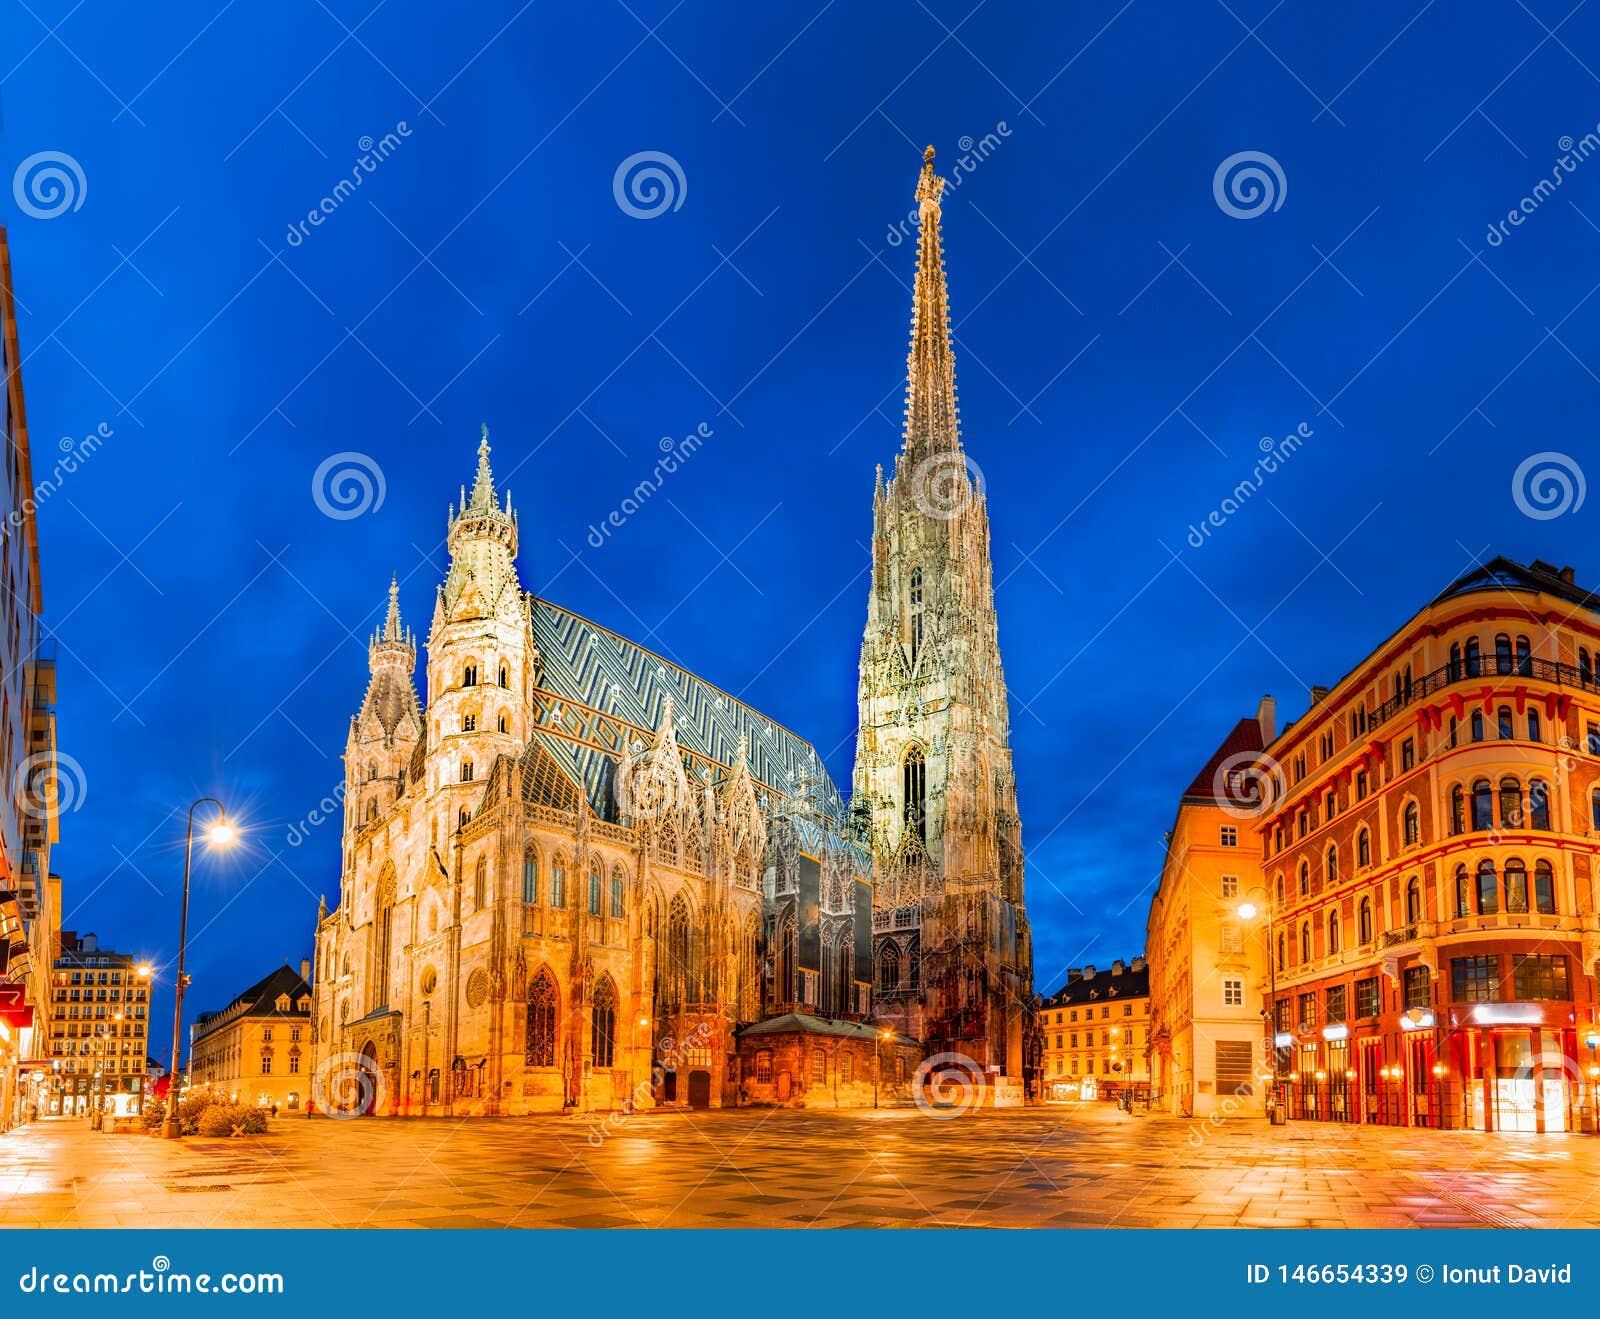 Вена, Австрия, Европа: Собор St Stephen или Stephansdom, Stephansplatz